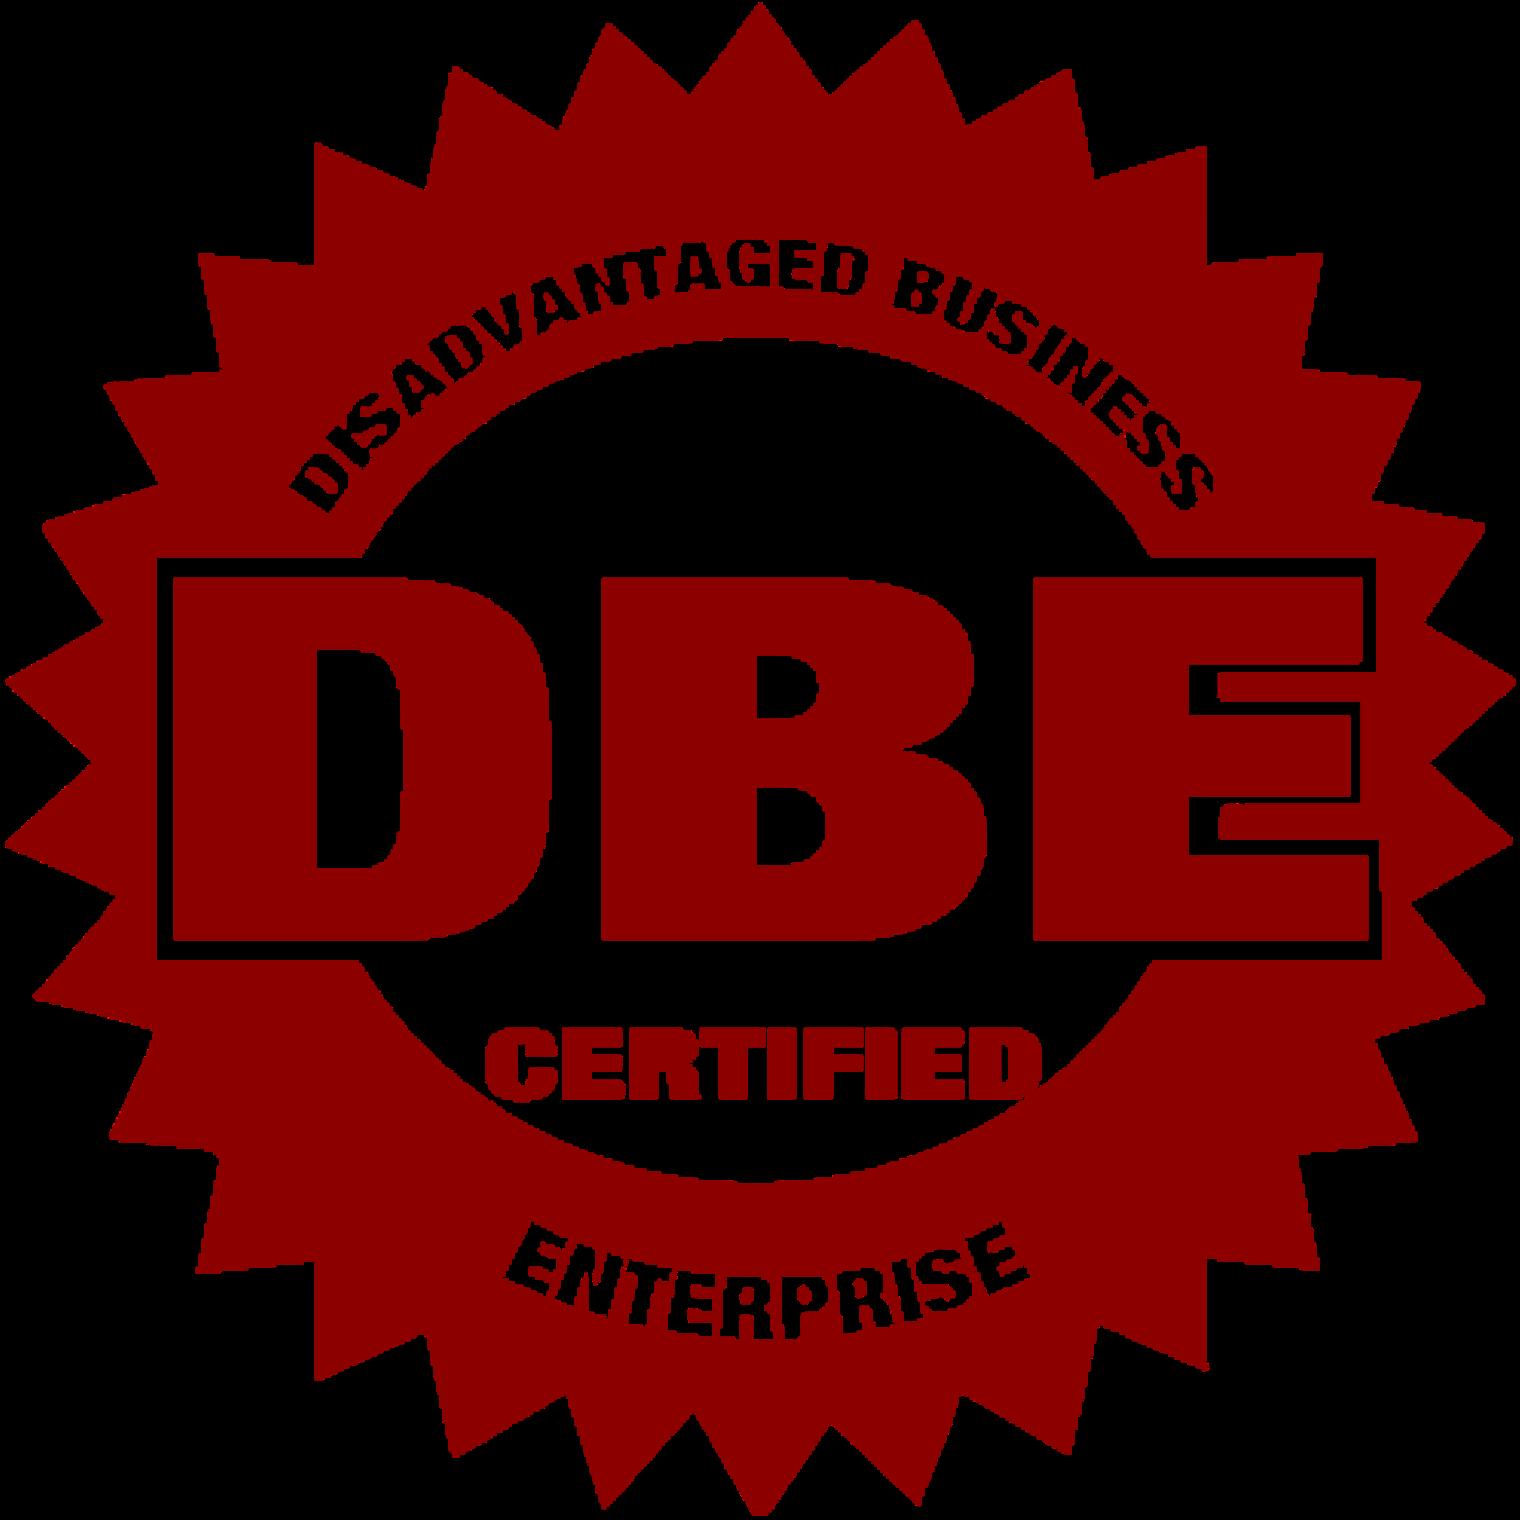 pss-differentiatorsicon-dbe-red